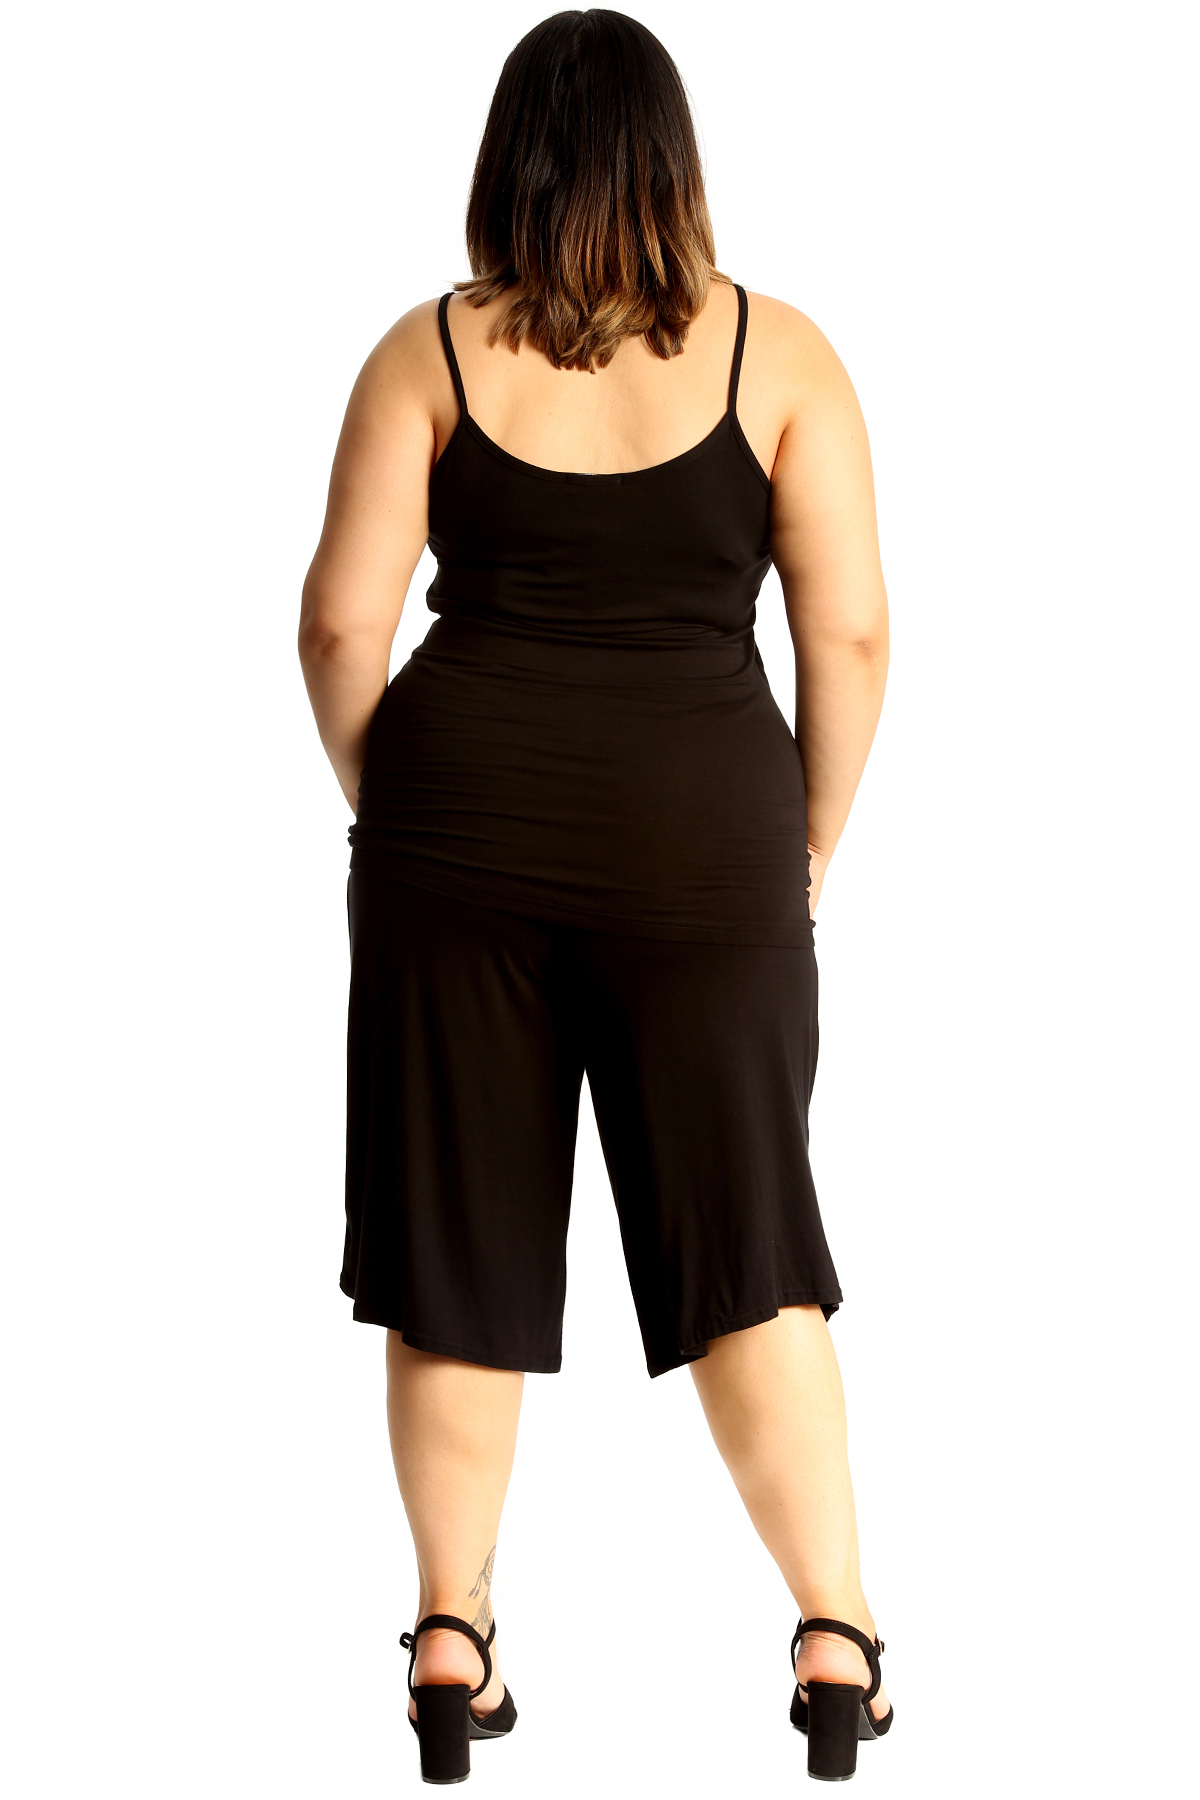 New-Womens-Plus-Size-Culottes-Ladies-Plain-Shorts-Palazzo-Elastic-Pants-Summer thumbnail 16